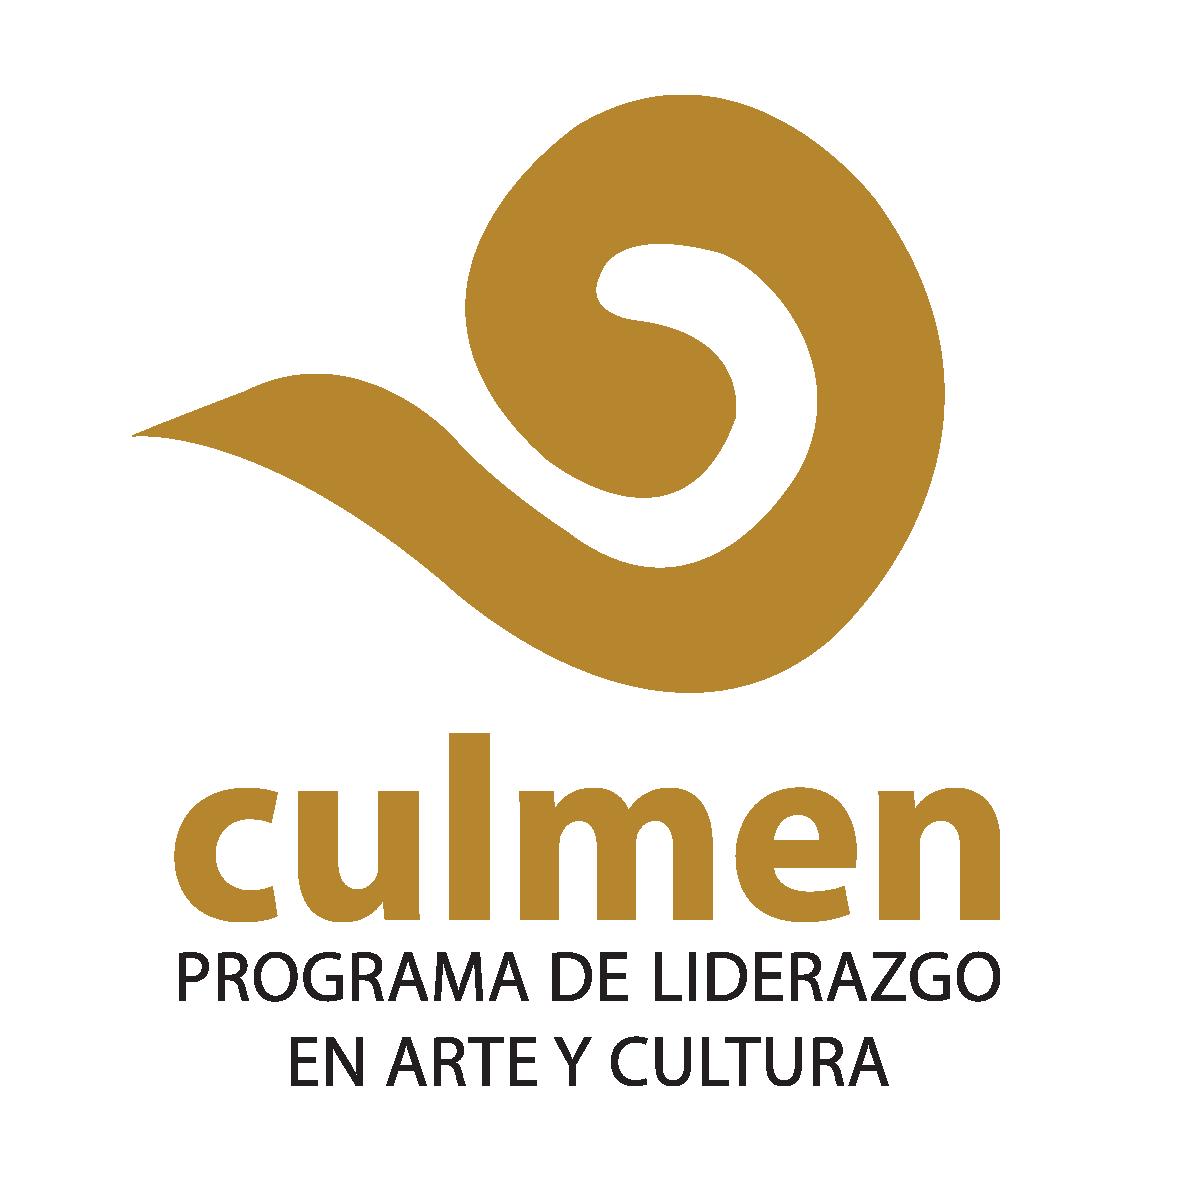 logo-culmen.png